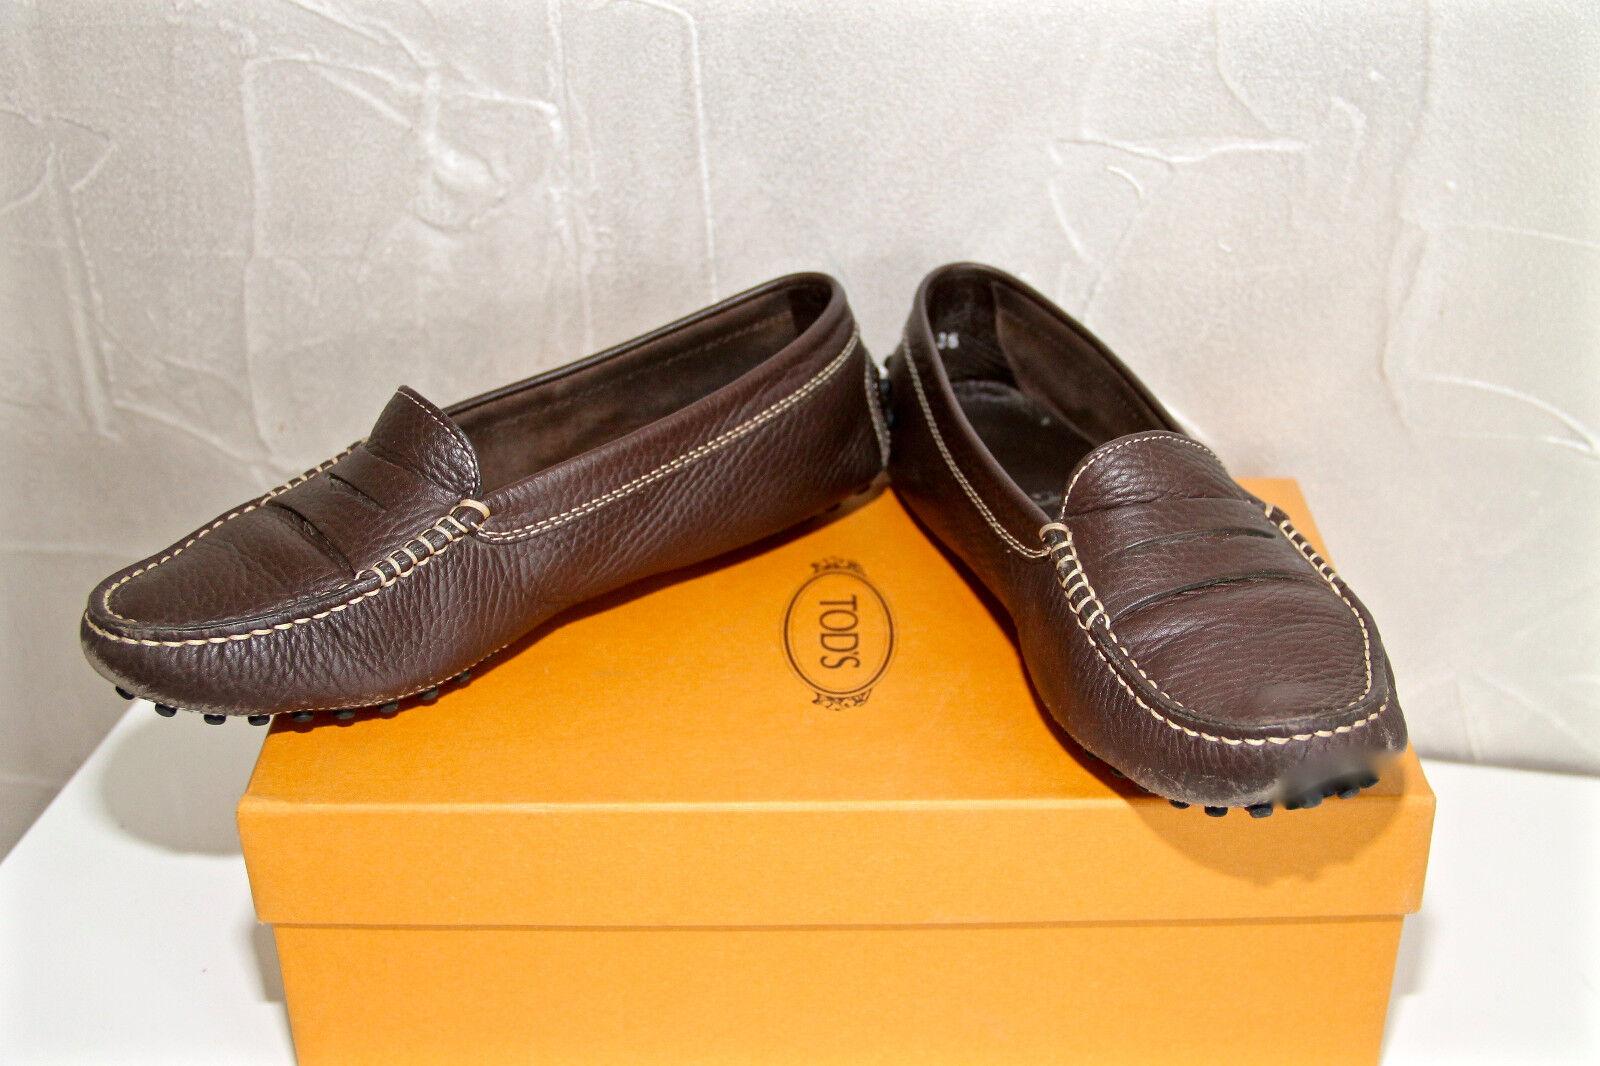 Lussuoso mocassini TOD'S senza lacci scarpe pelle marrone TOD'S TOD'S TOD'S   570fc4